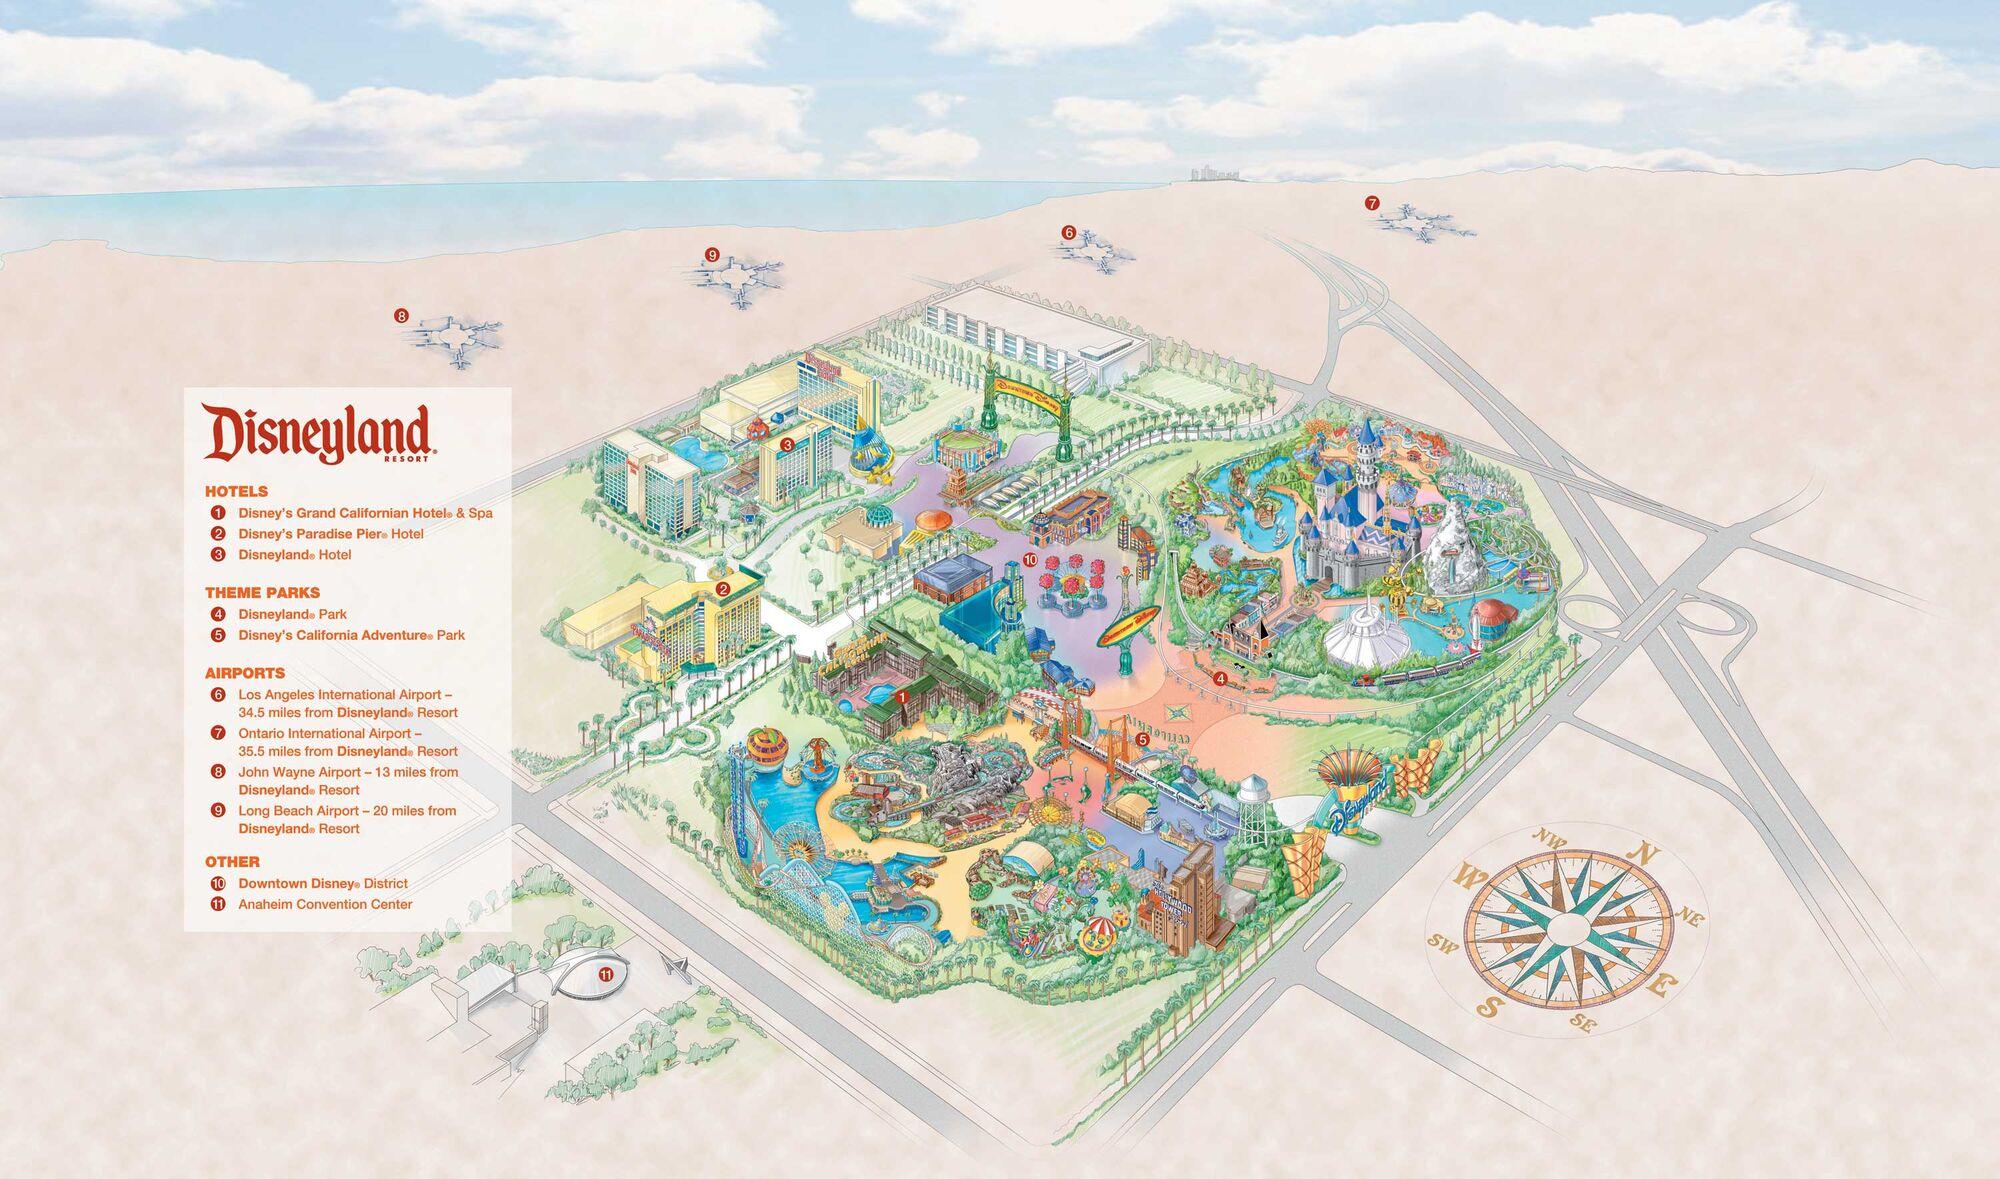 Image  Disneyland Resort Mapjpg  Disney Wiki  FANDOM powered